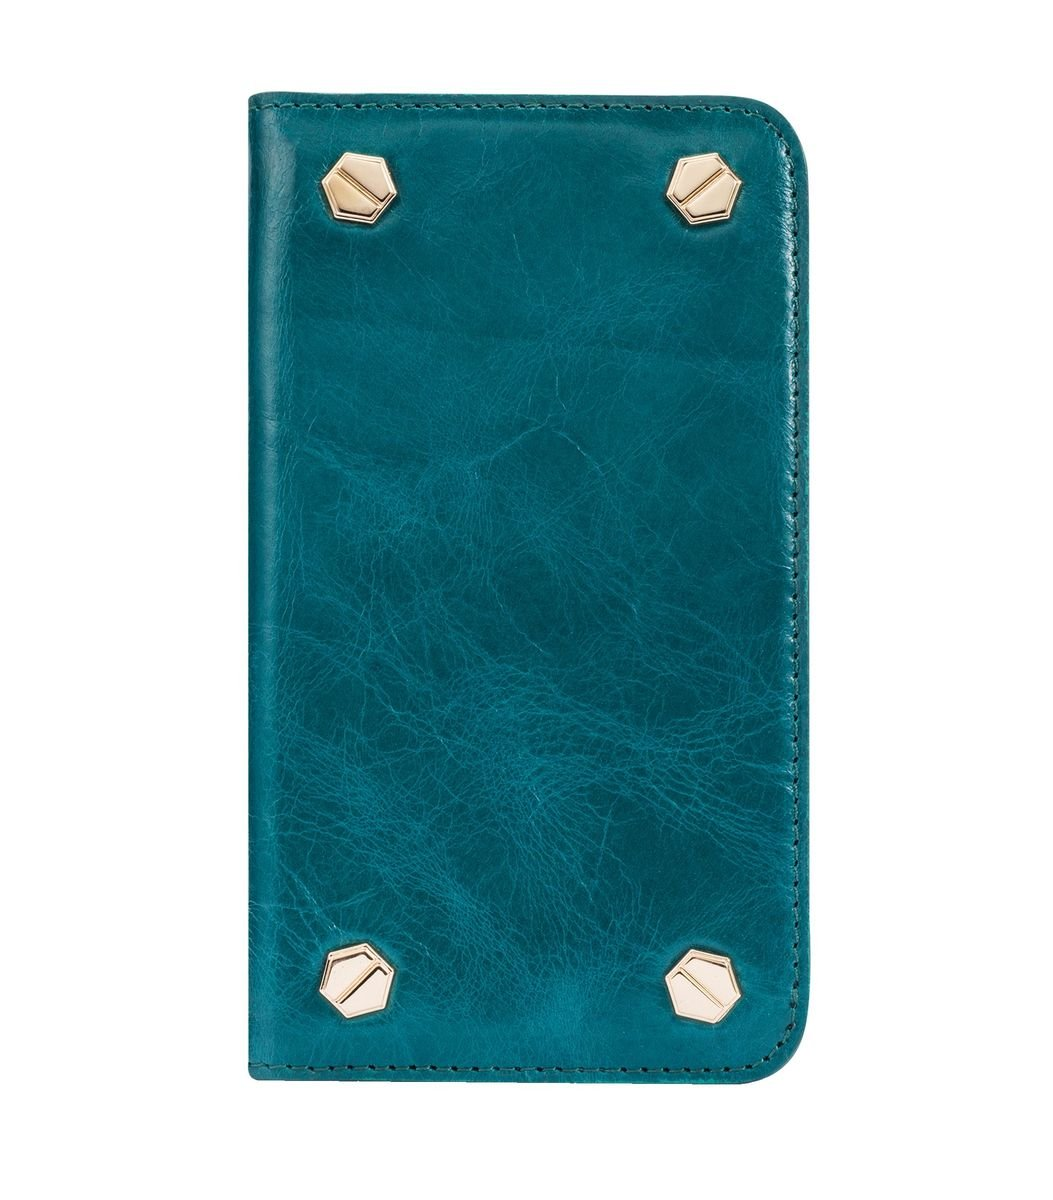 "Apple Iphone 6/6s (4.7"") Hex-shine 系列高級牛皮時尚手機套 (奧利佛藍色)"